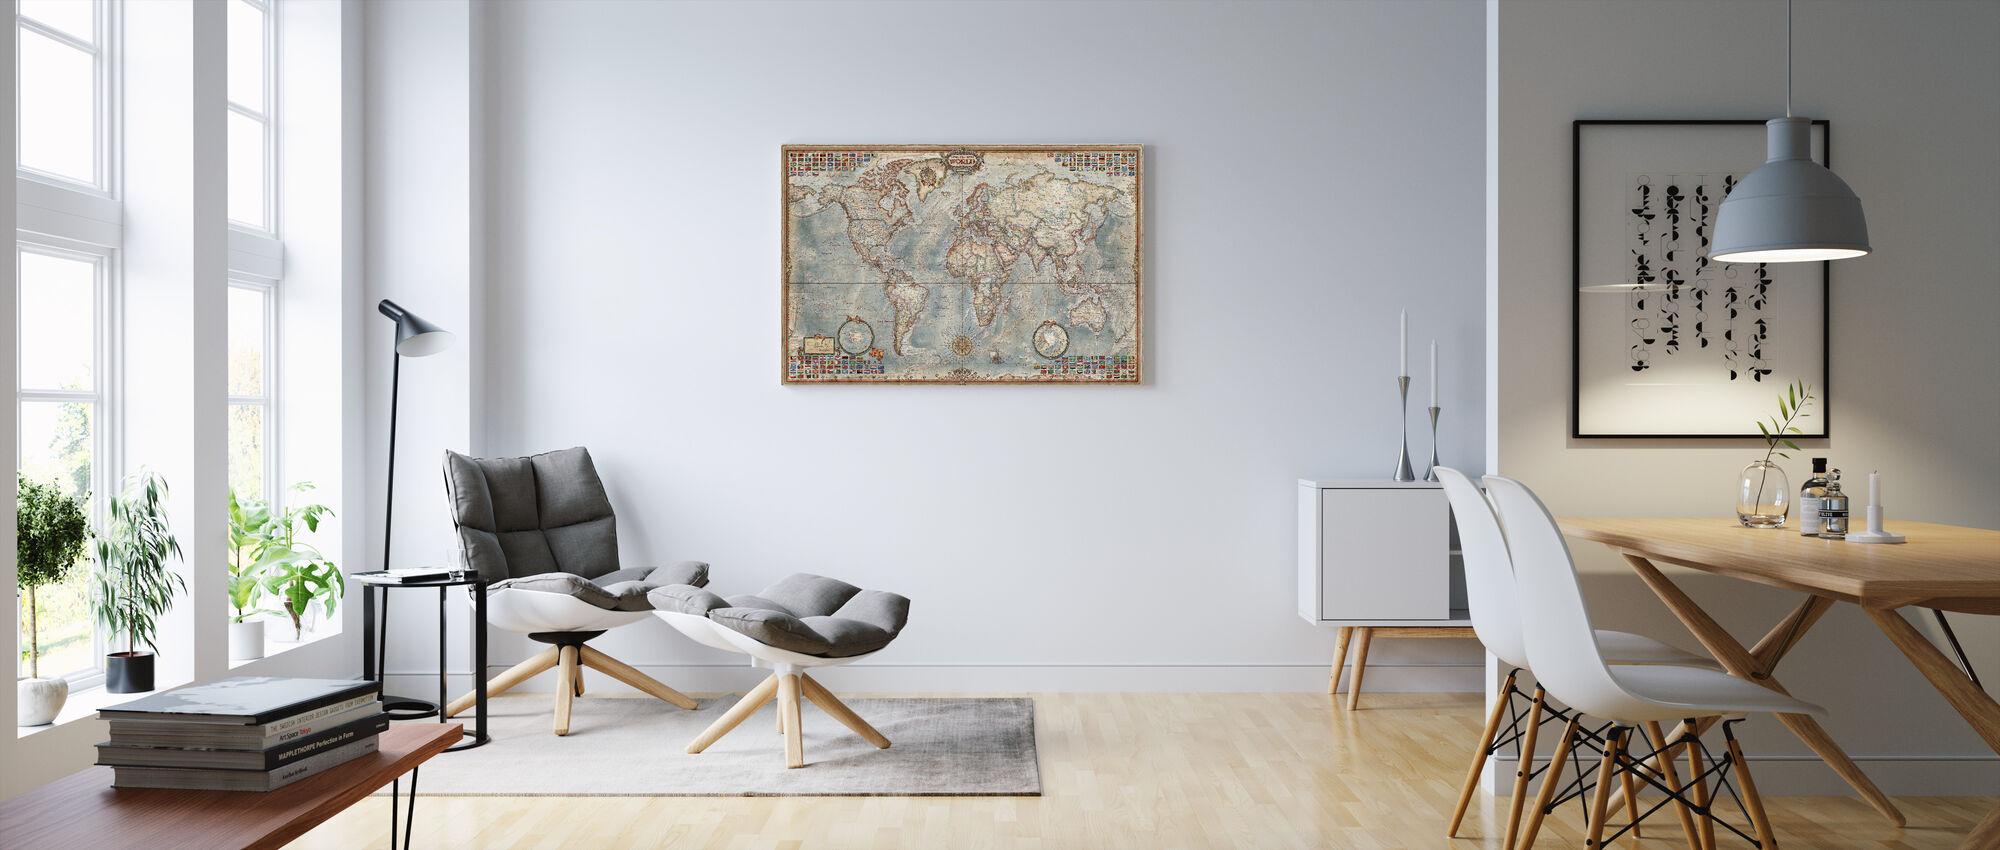 Executive Karta - Canvastavla - Vardagsrum